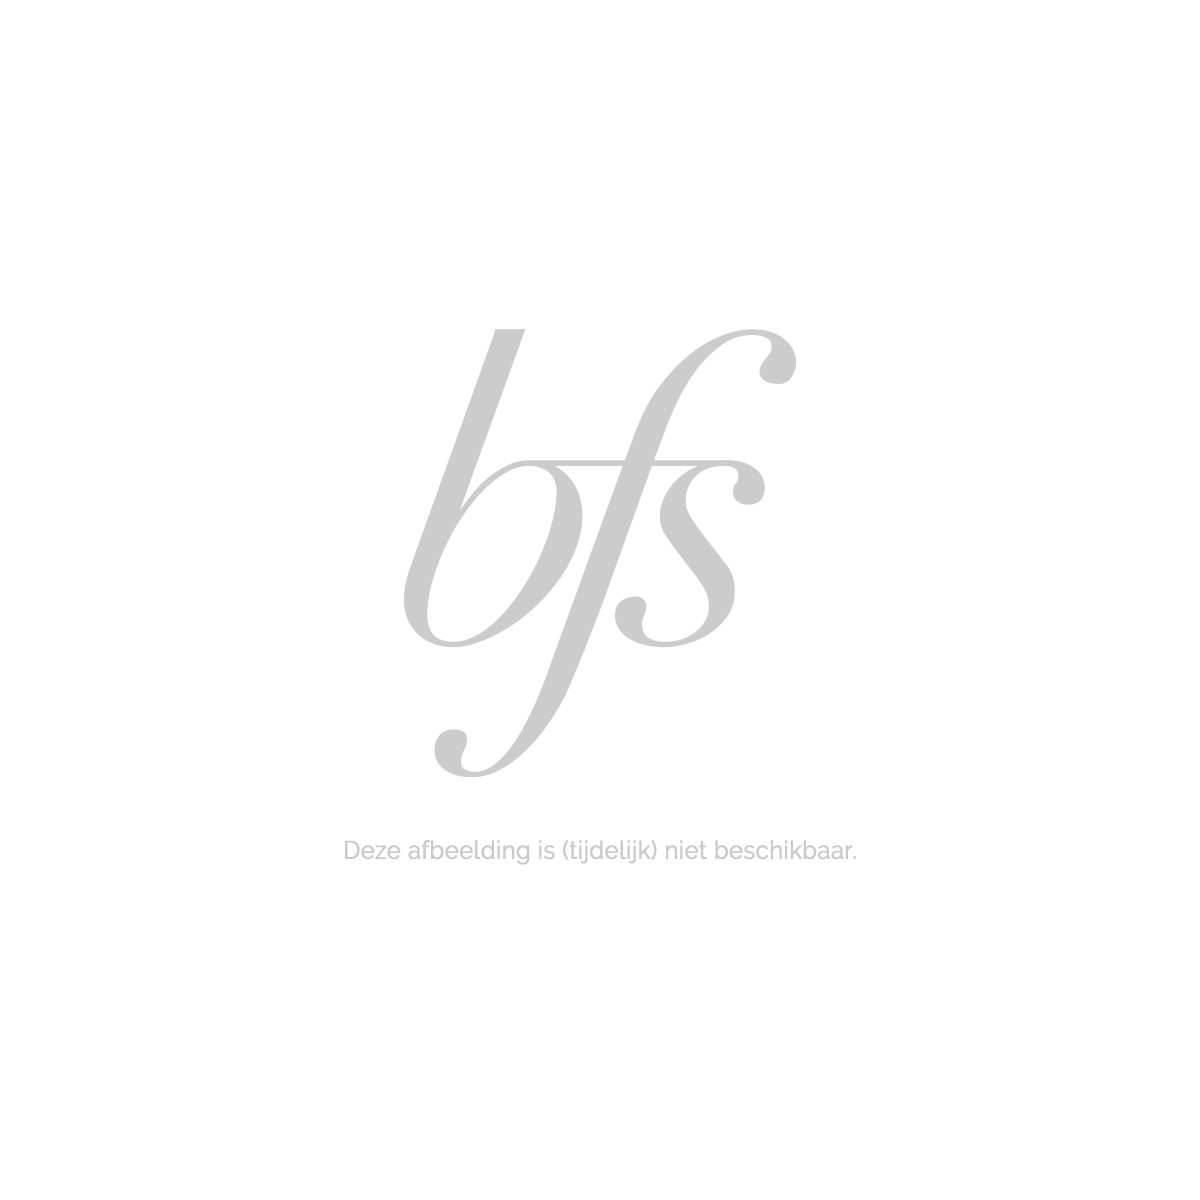 Diva Professional Styling Keramische Warmteborstel 40Mm